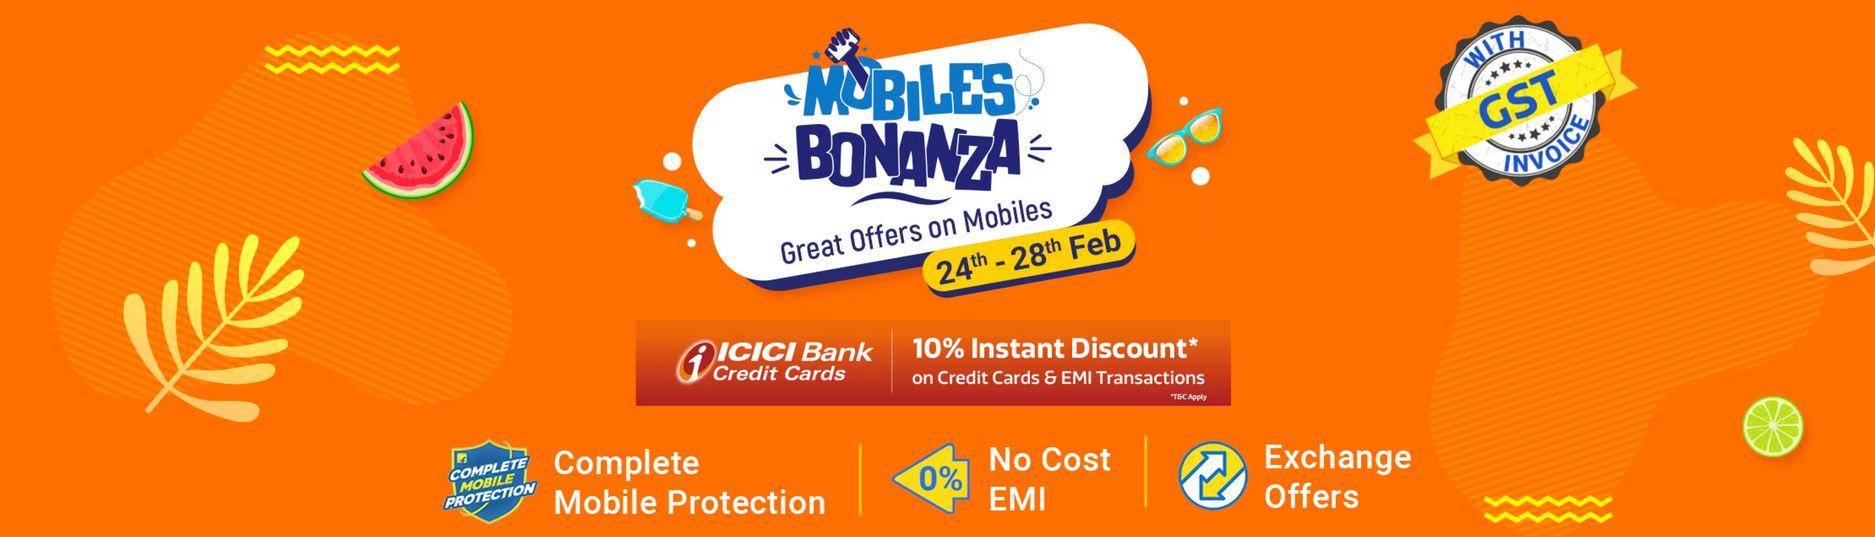 Flipkart Mobile Bonanza Sale February 2021